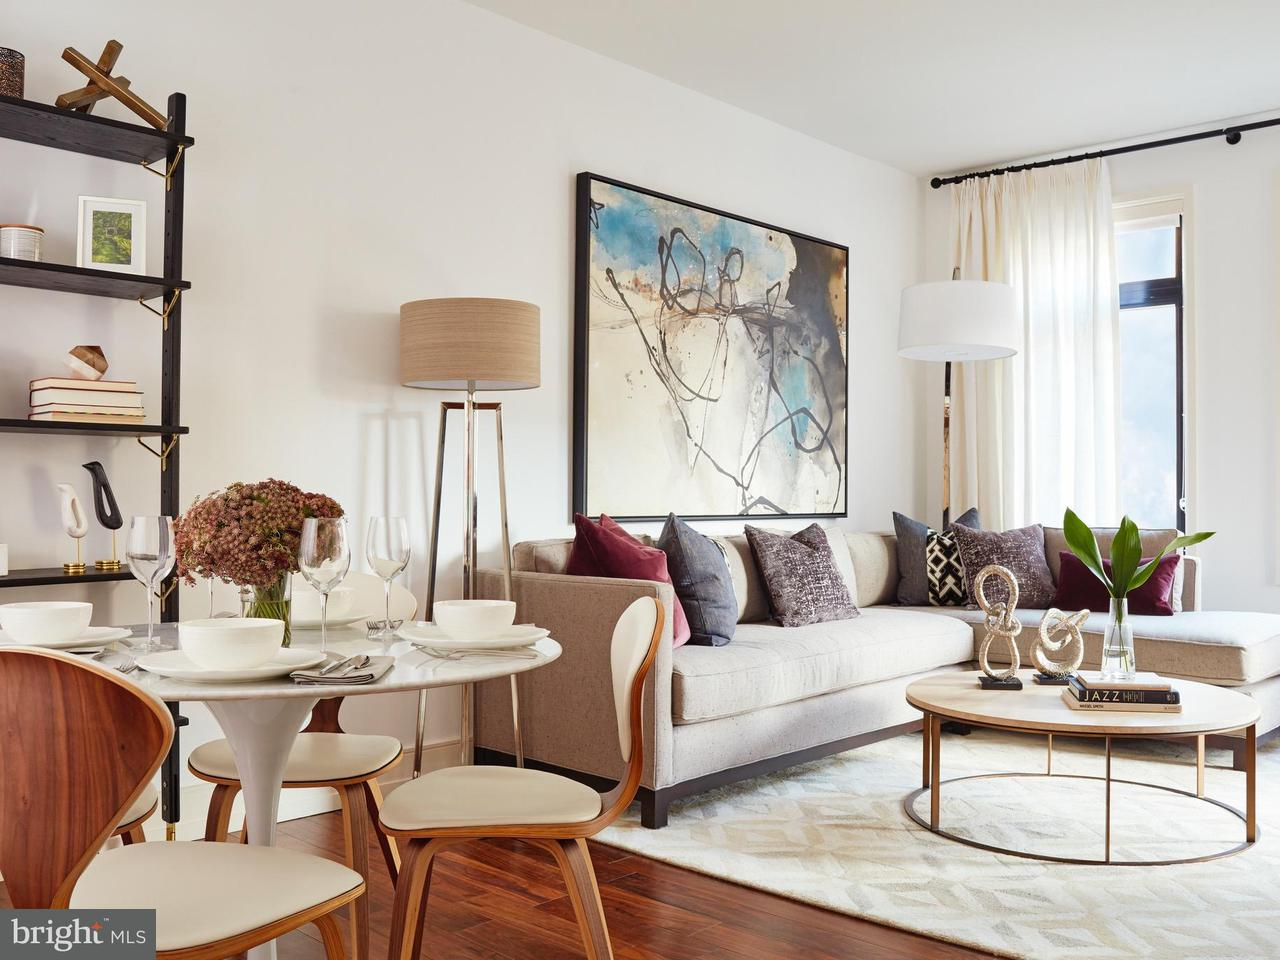 Condominium for Rent at 1310 U St NW #212 Washington, District Of Columbia 20009 United States